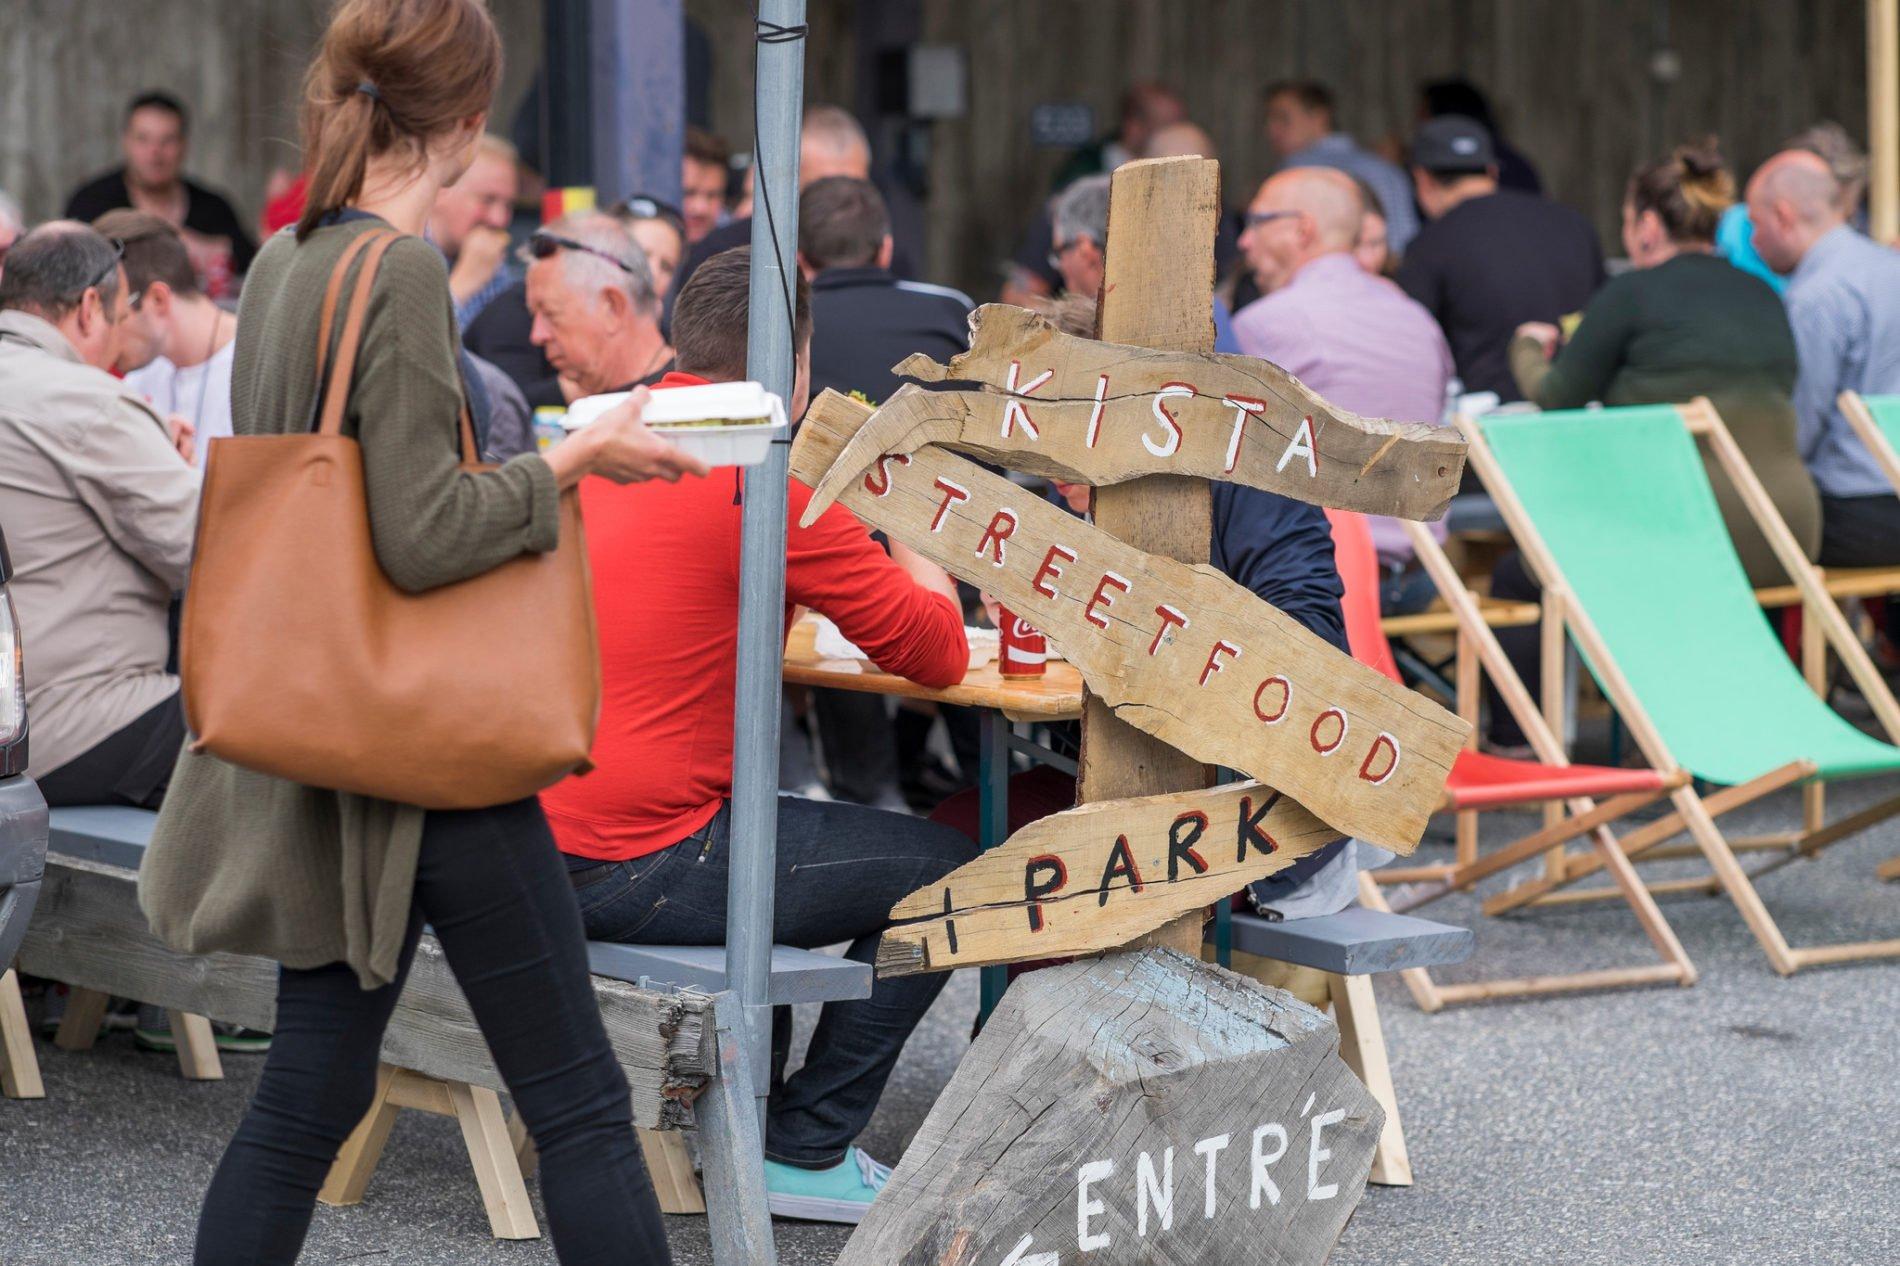 Kista Streetfood Park